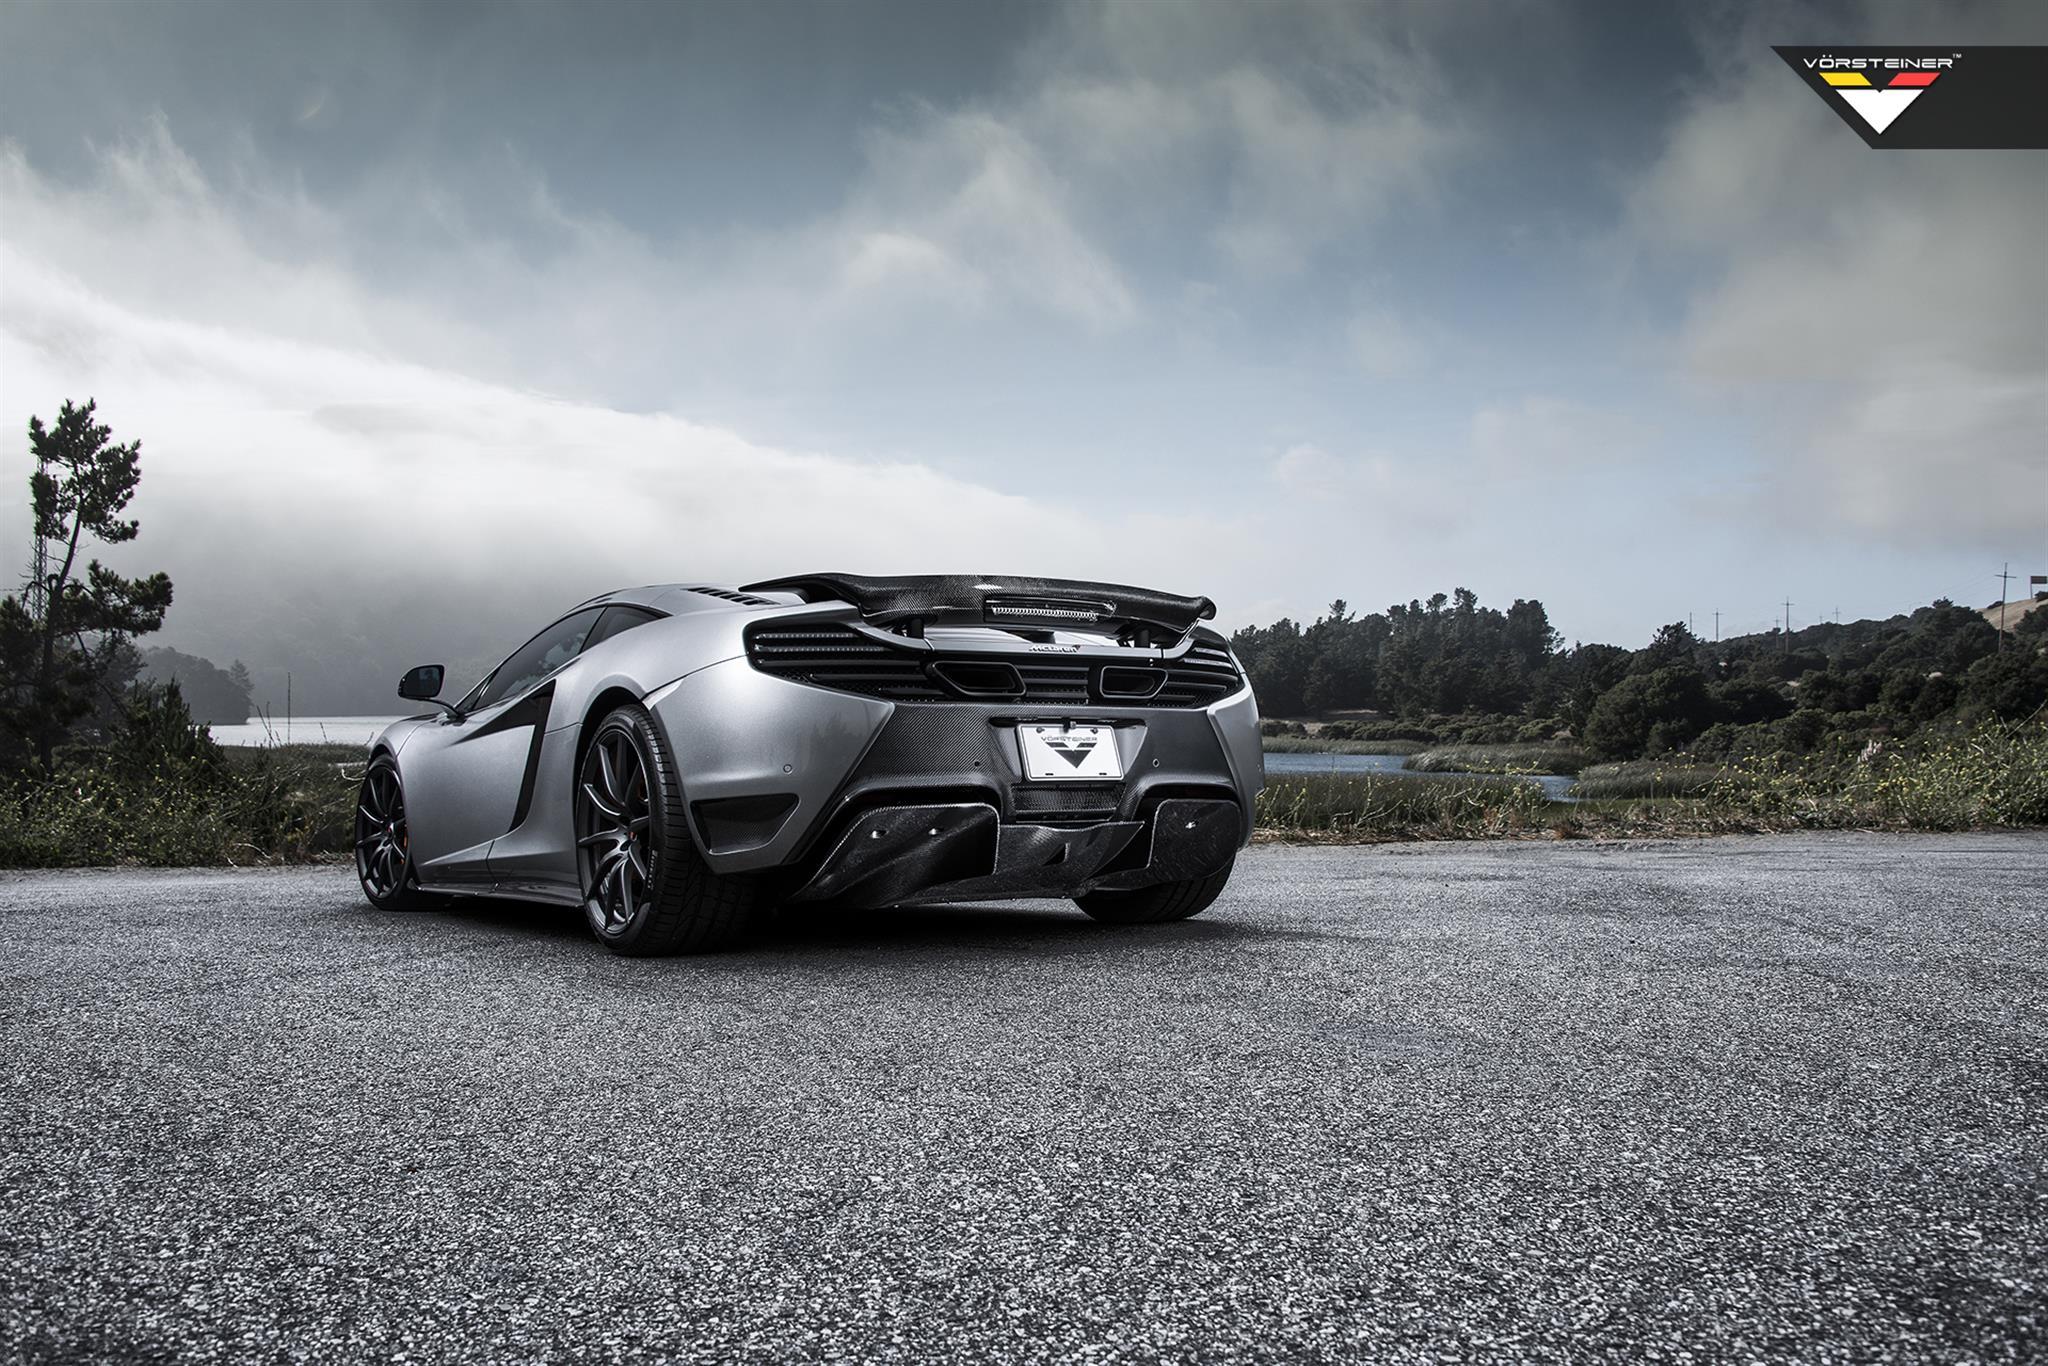 McLaren - MP4 -  - Wheels & Tires - Paint -  Wraps & Body